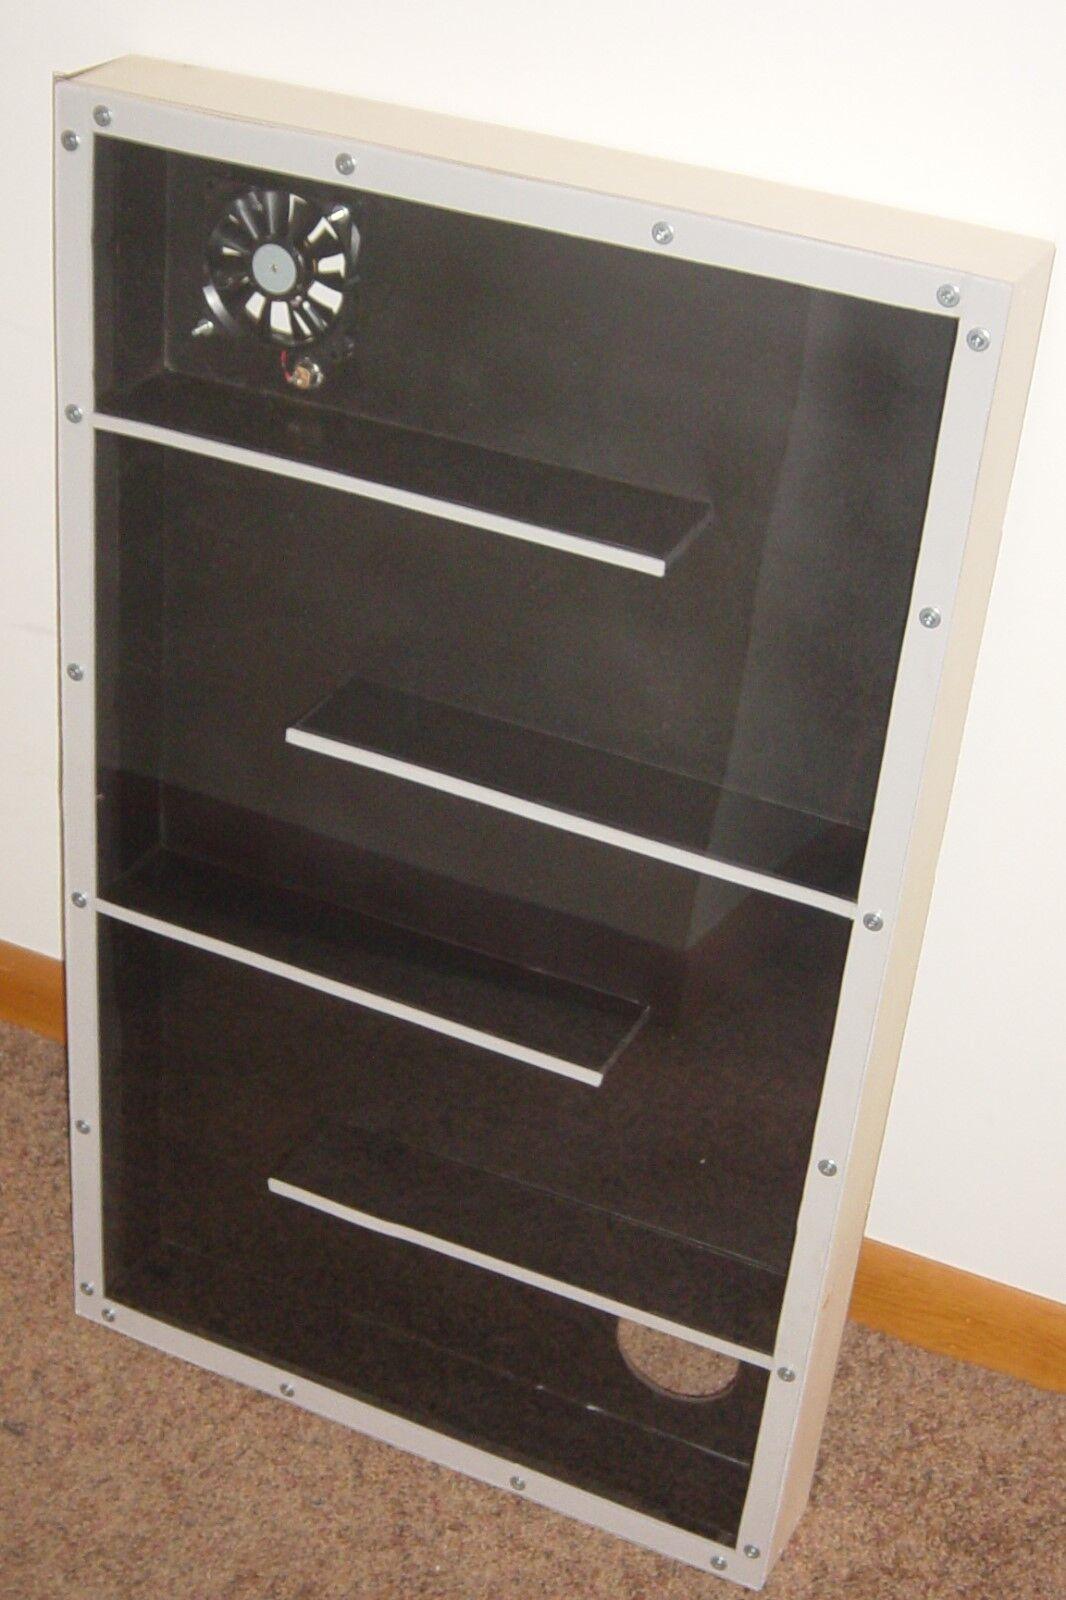 Solar Window Air Heater Panel Heater, FREE HEAT Save Money, NEW UPDATED MODEL